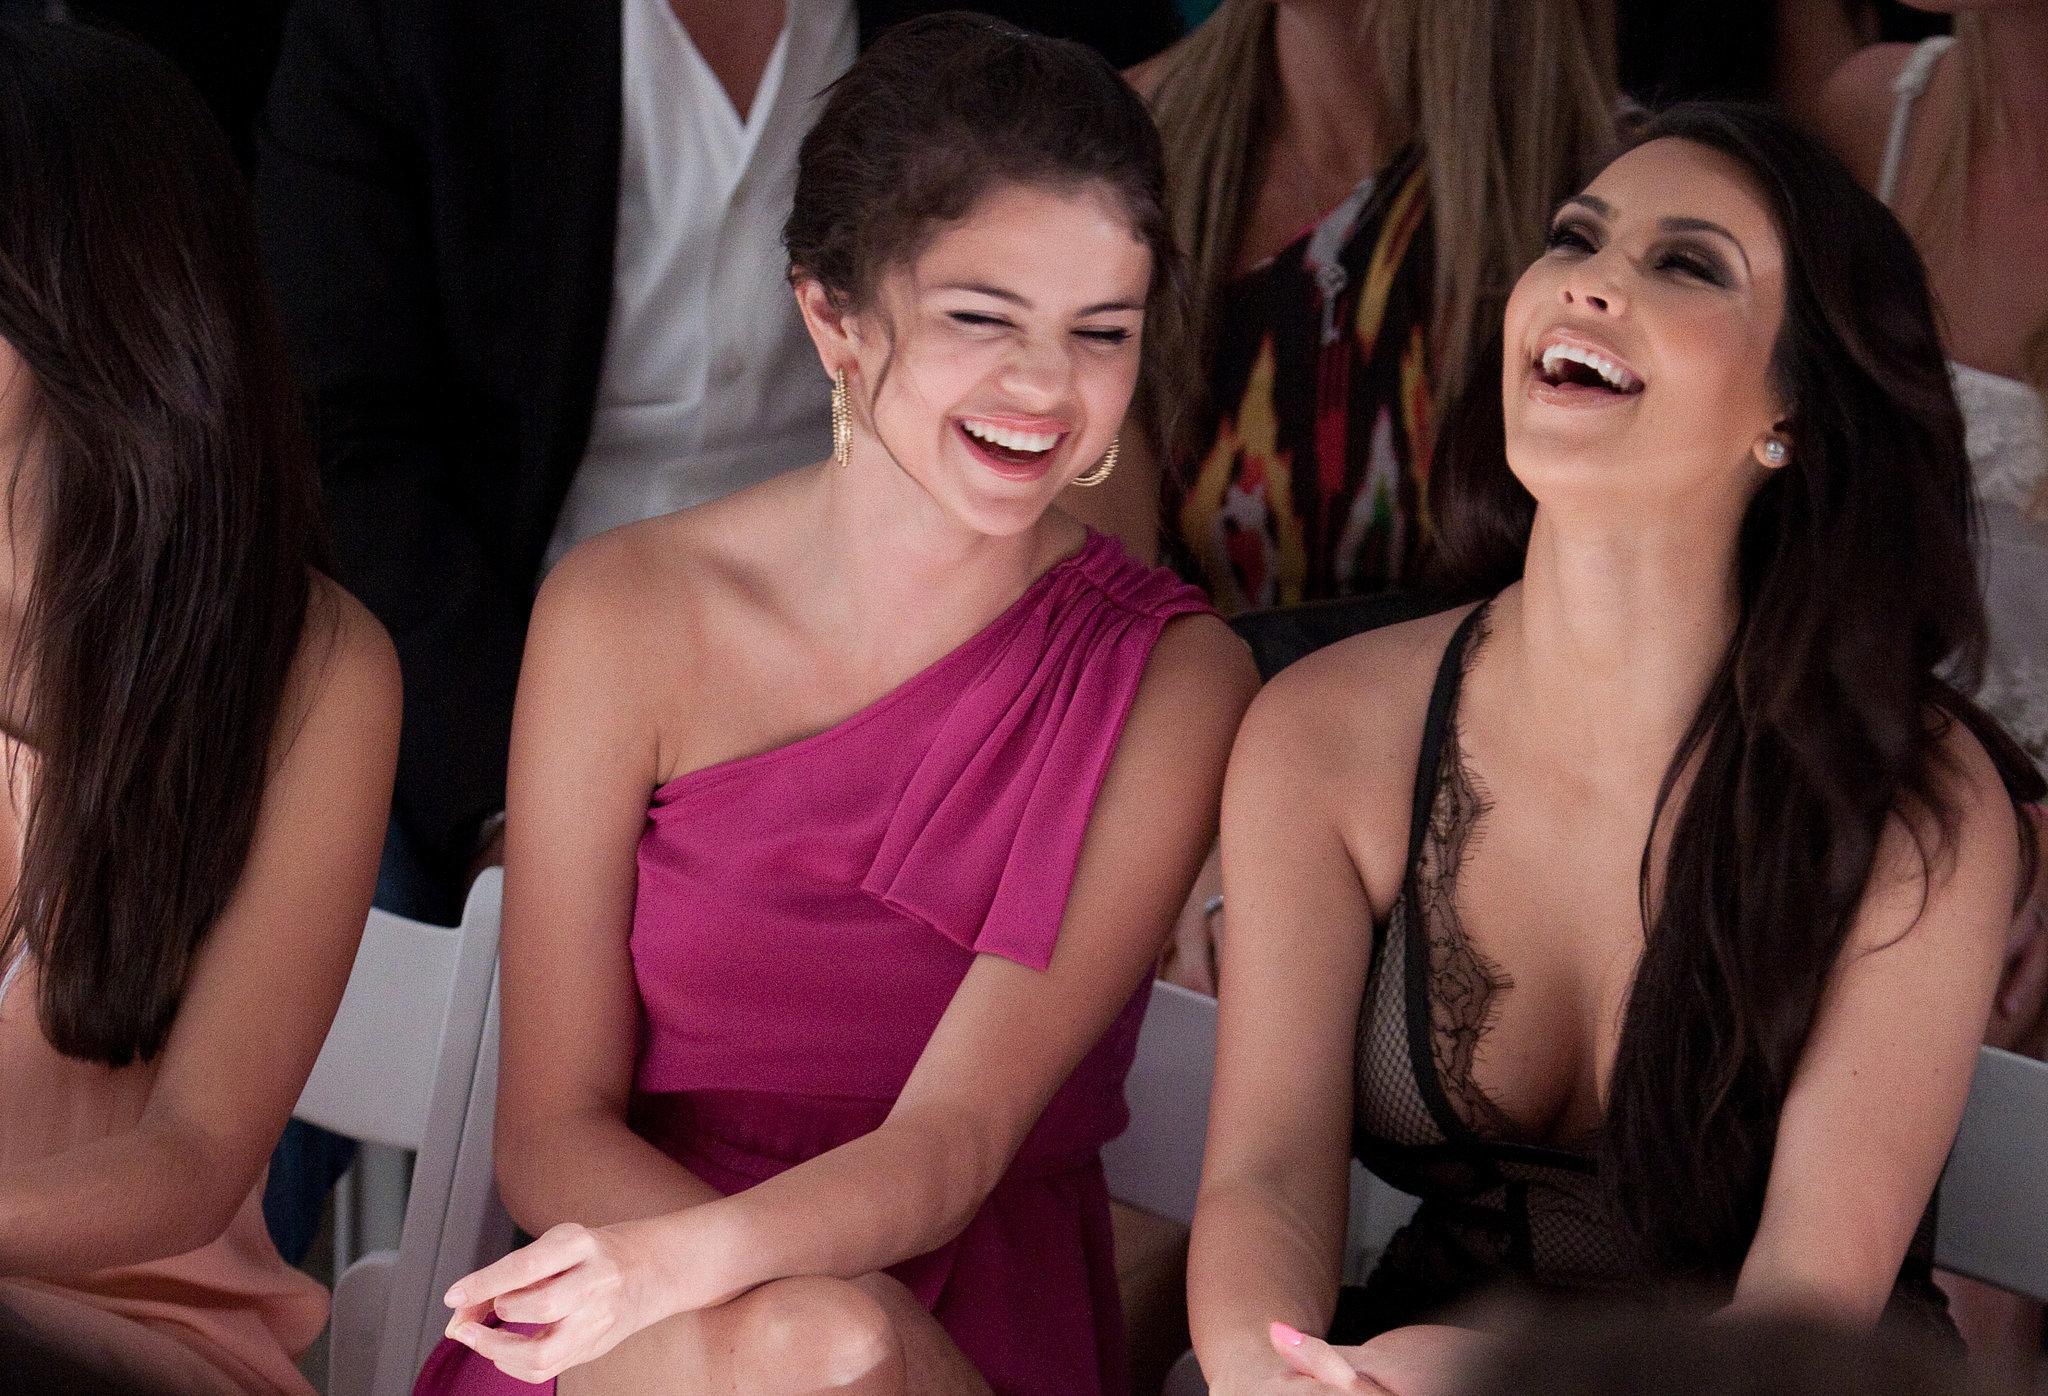 Selena Gomez and Kim Kardashian laughed in July 2010 at Miami Fashion Week.